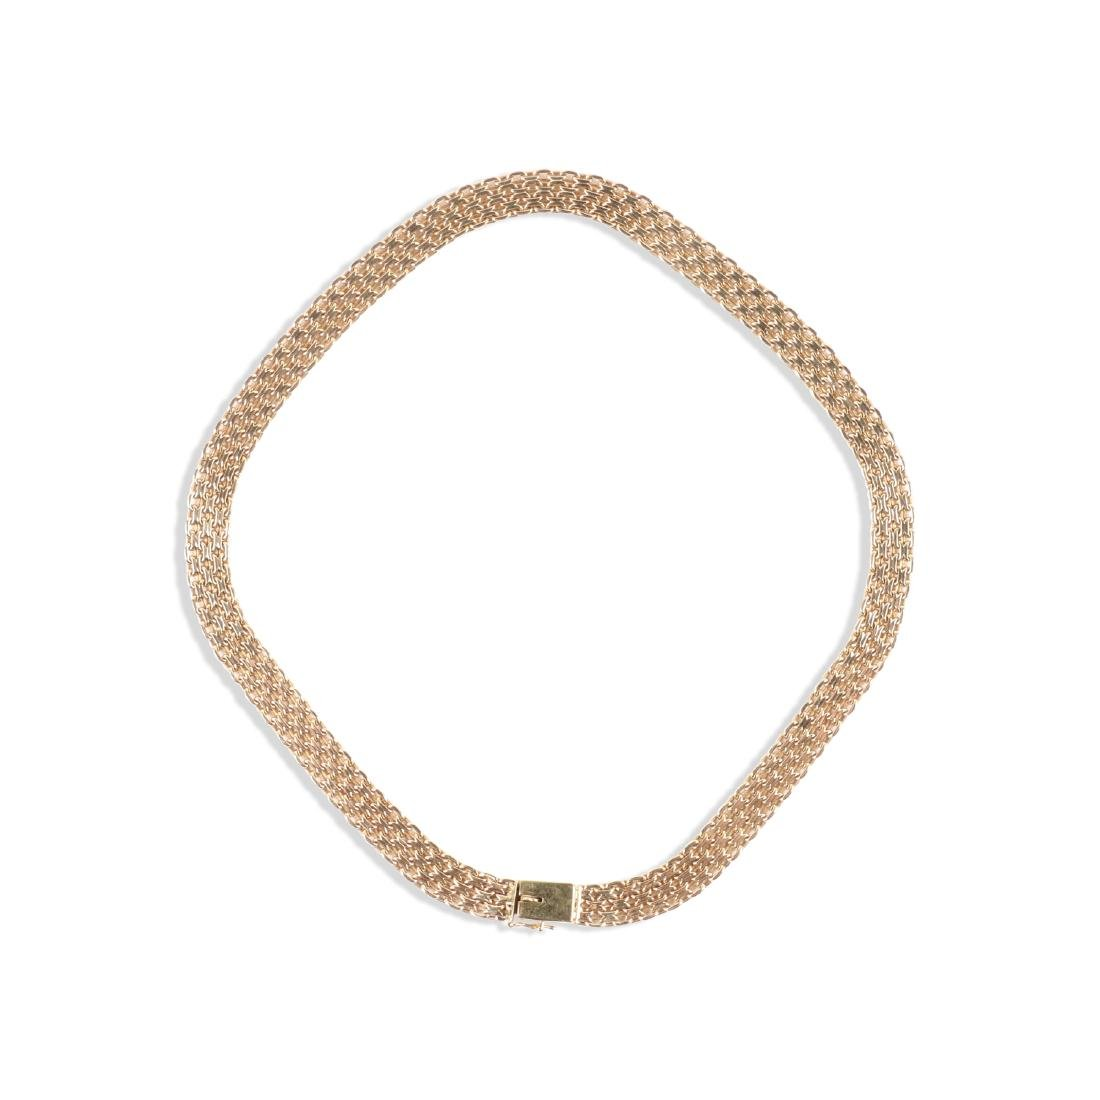 A 14K Yellow Gold Choker Necklace